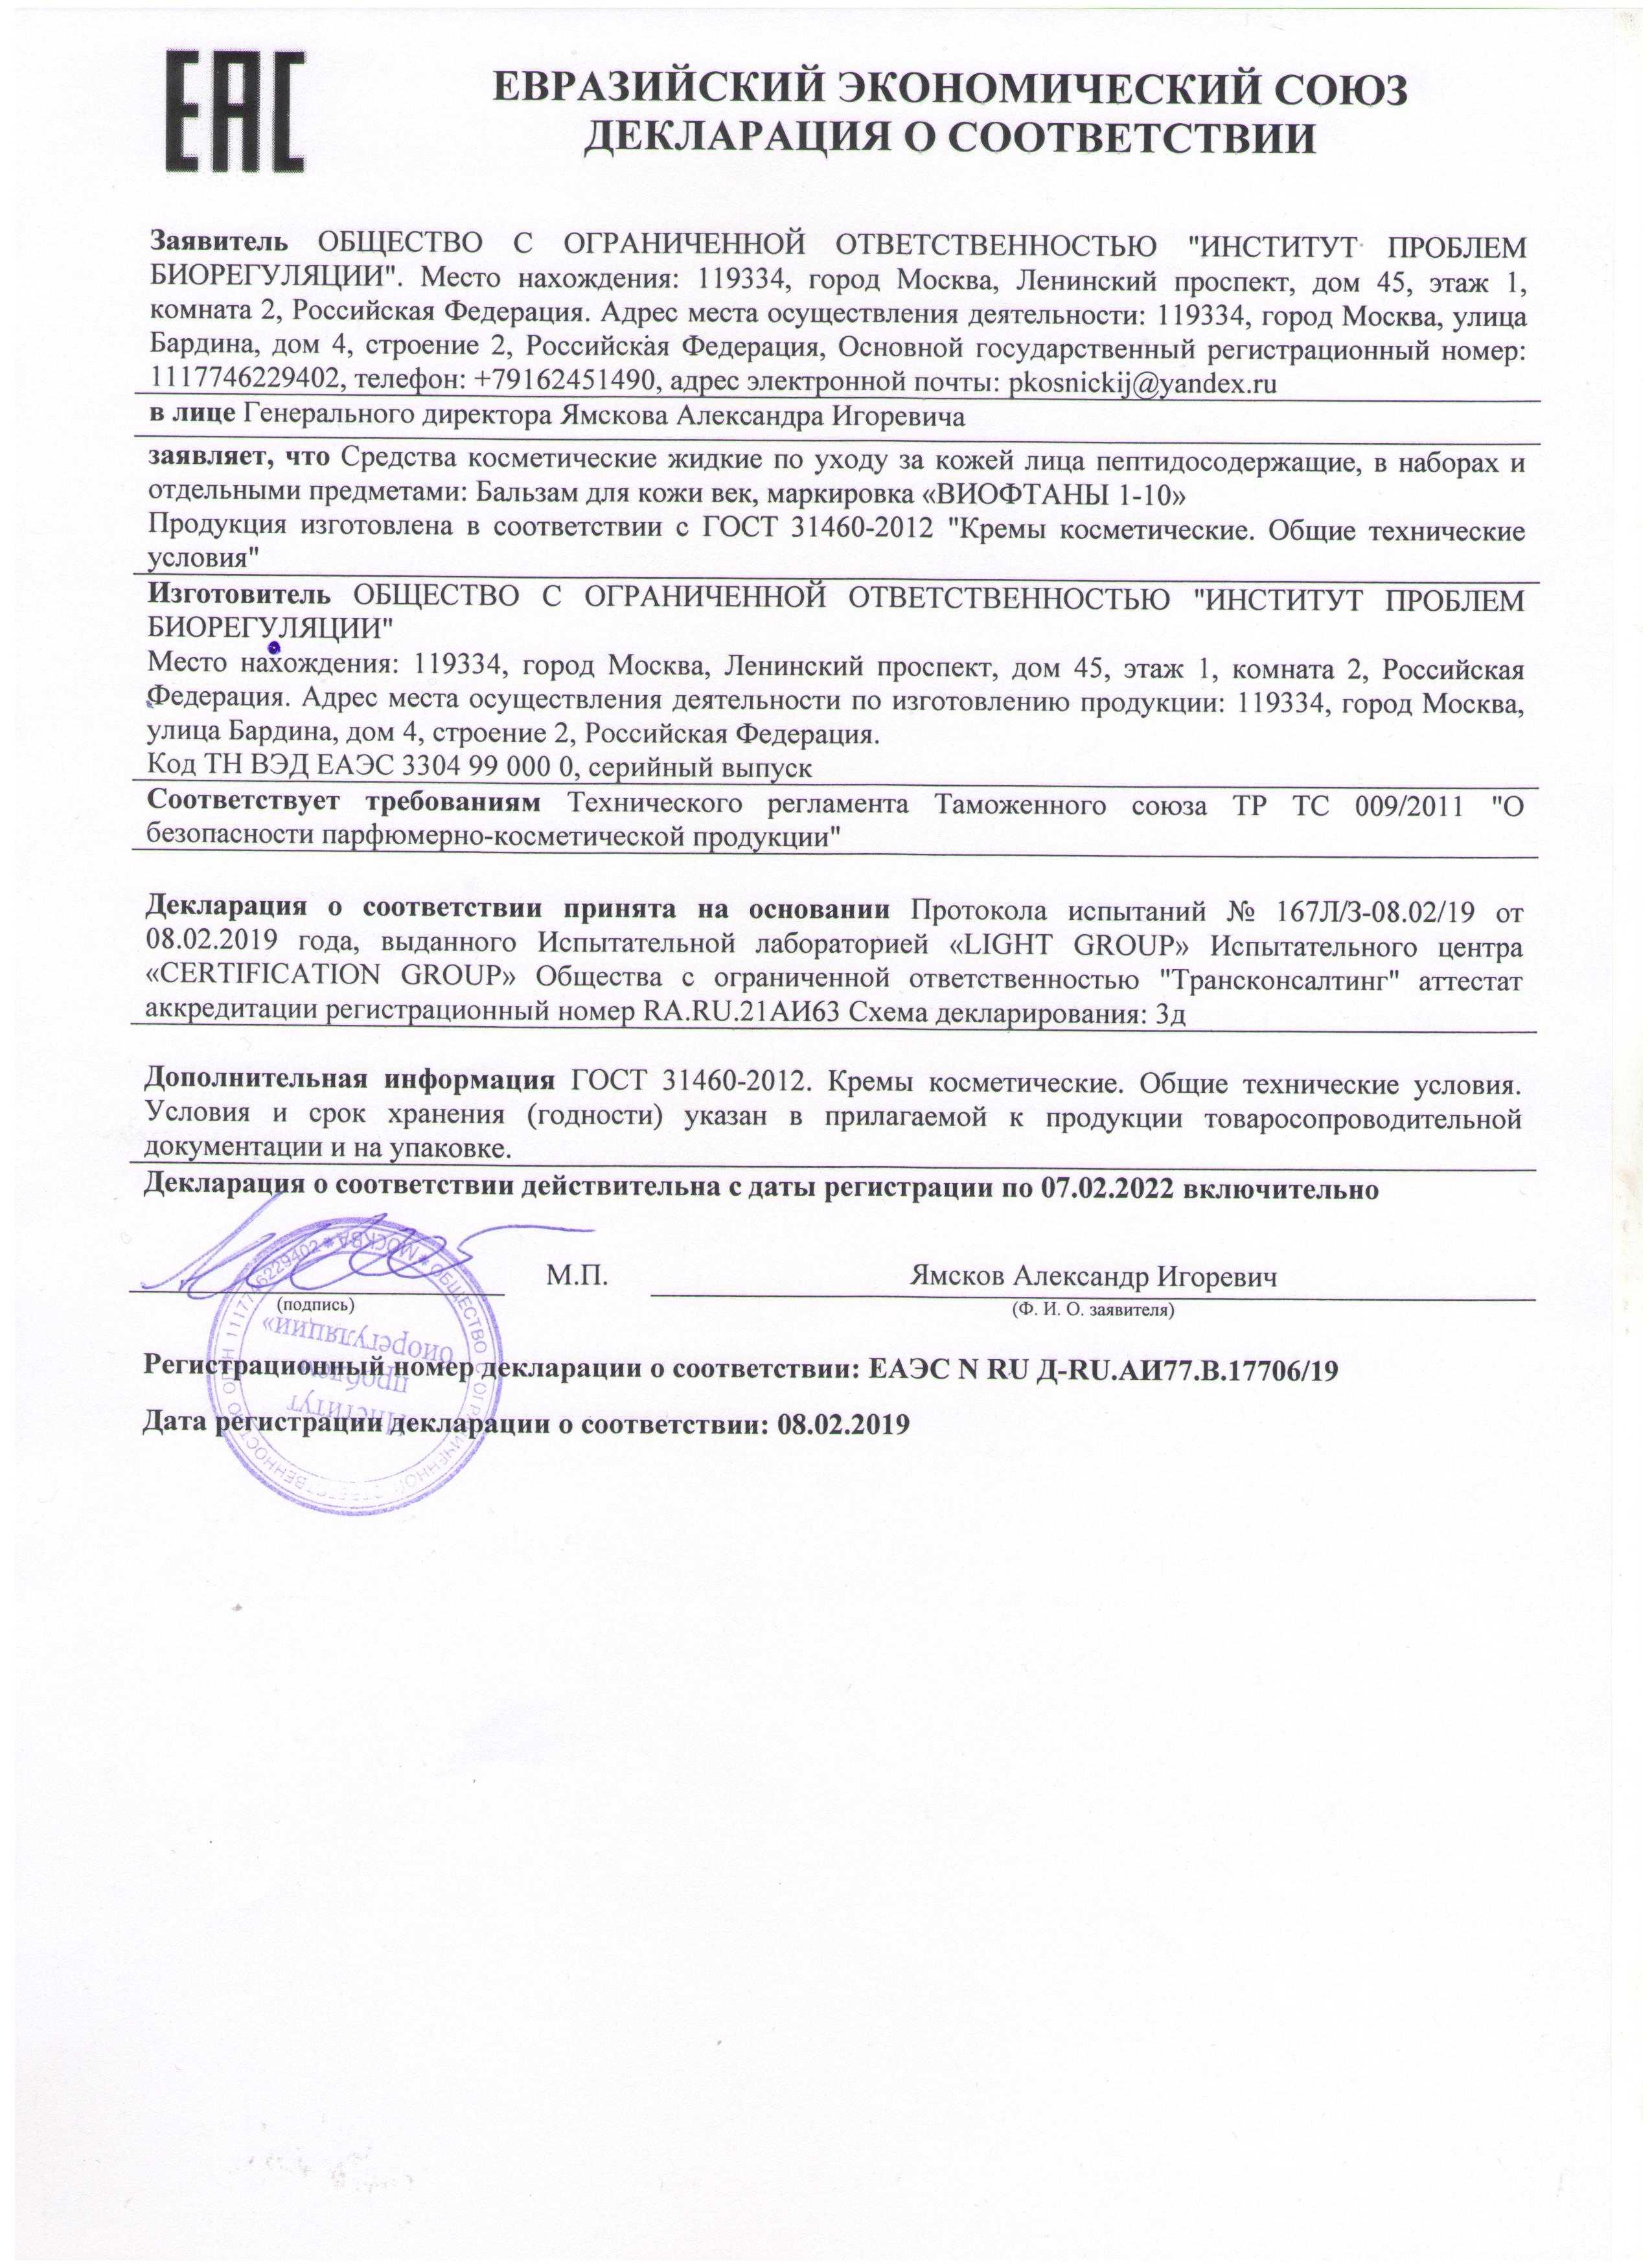 Декларация Виофтан